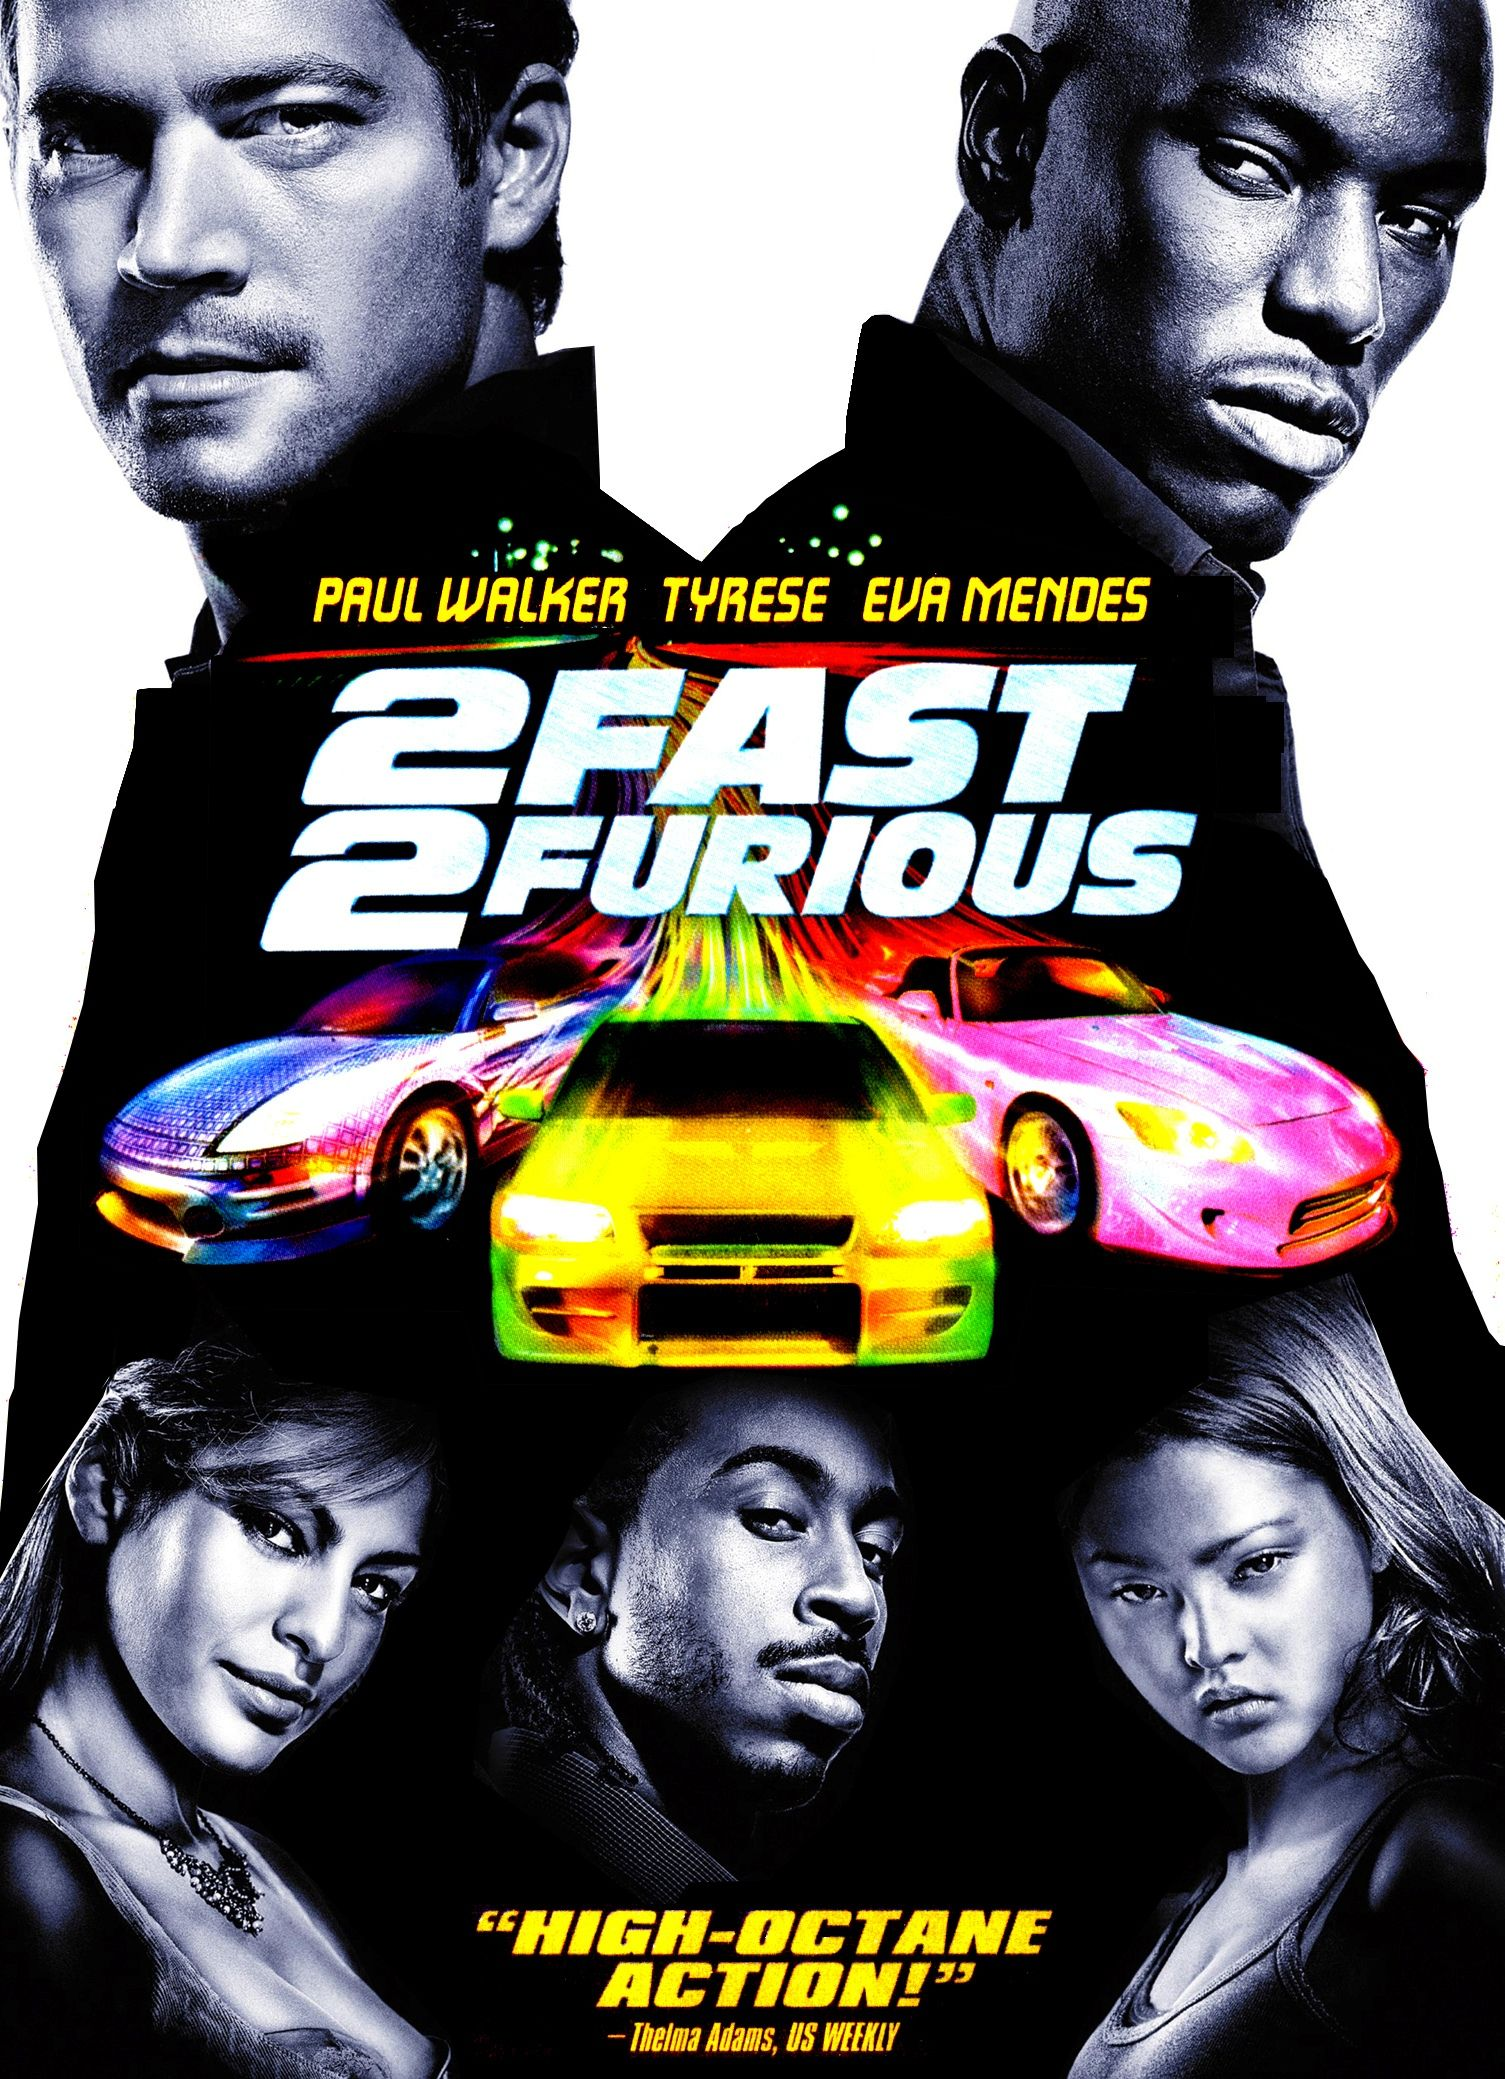 2 fast 2 furious furious movie movie pic fast furious